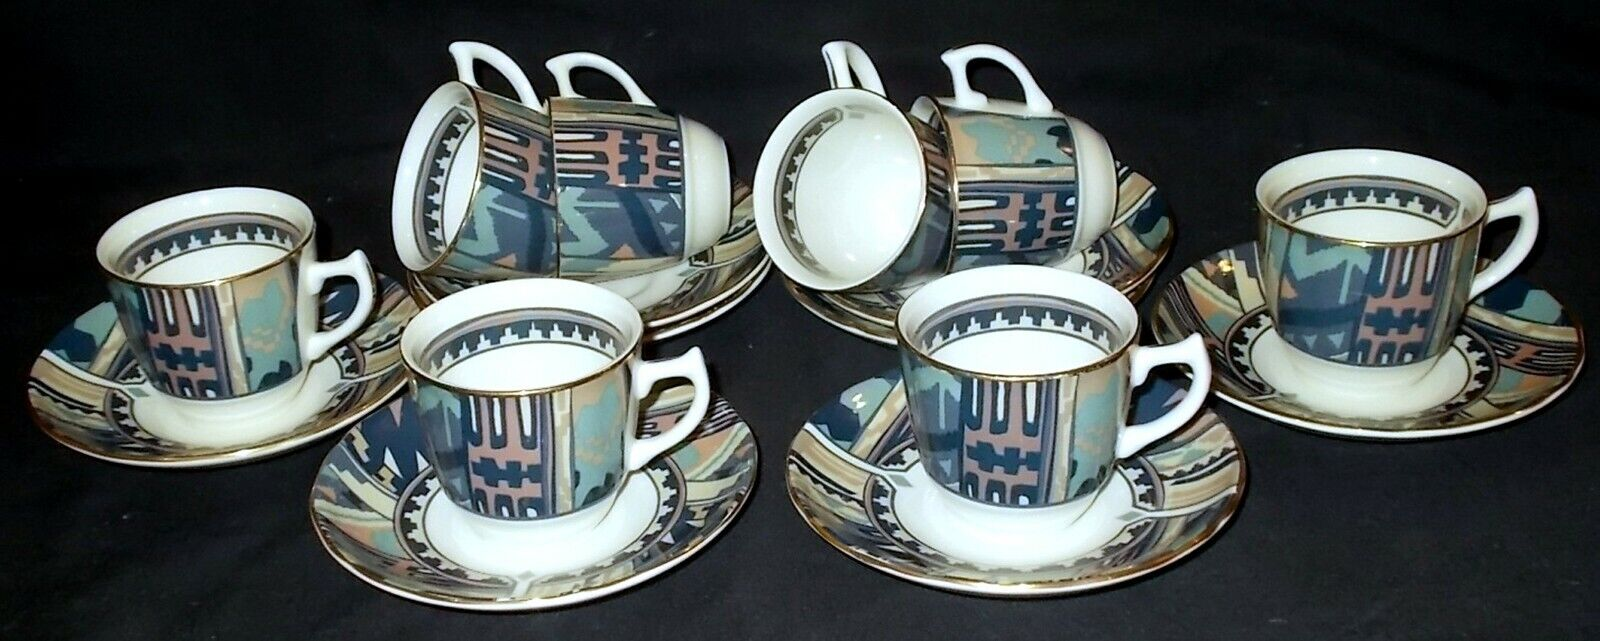 Image 01 - EIGHT Masons Liberty London ZEBAK Coffee Cups and Saucers